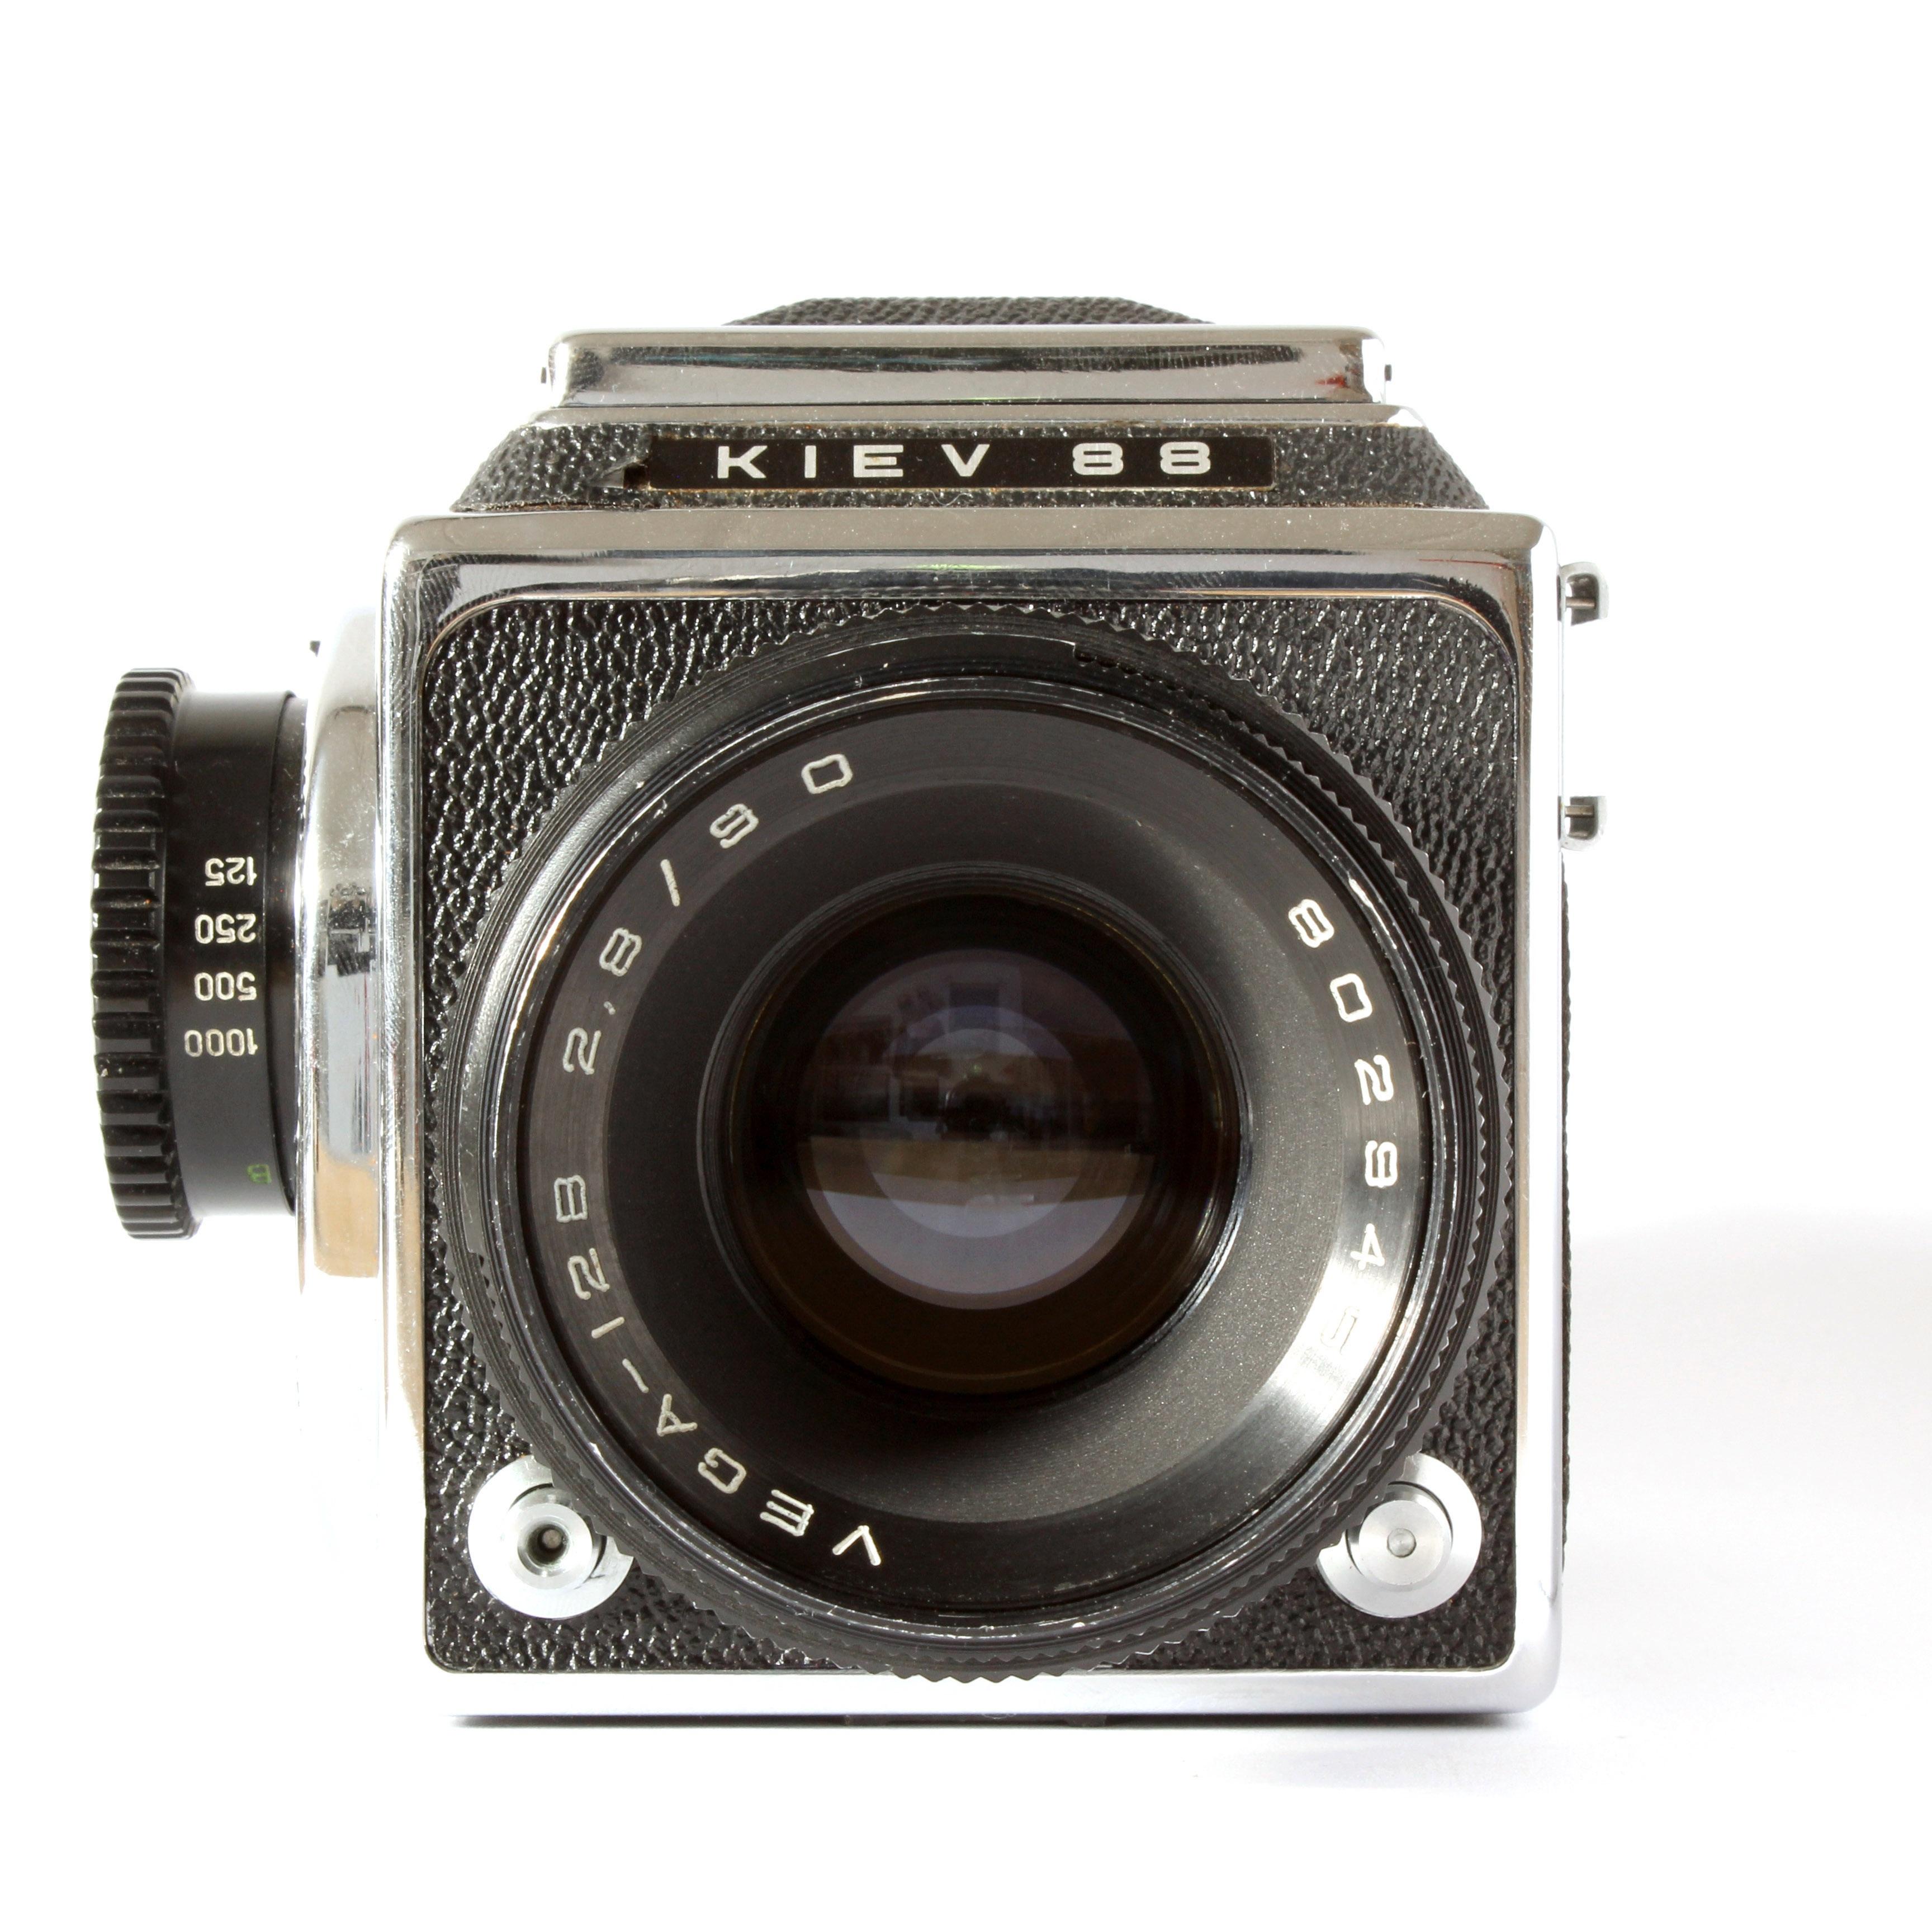 Free Images : photography, vintage, antique, nostalgia, close ...